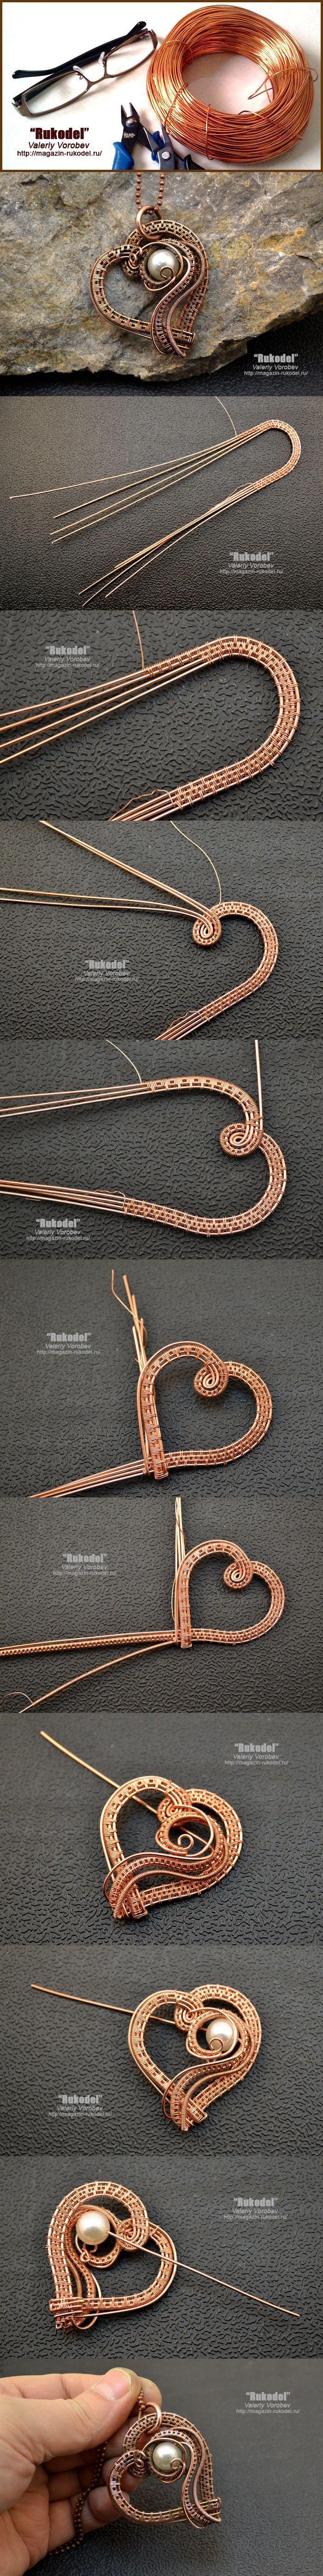 Wire Wrap Pendant - magazin-rukodel.ru | Schmuck selber machen ...